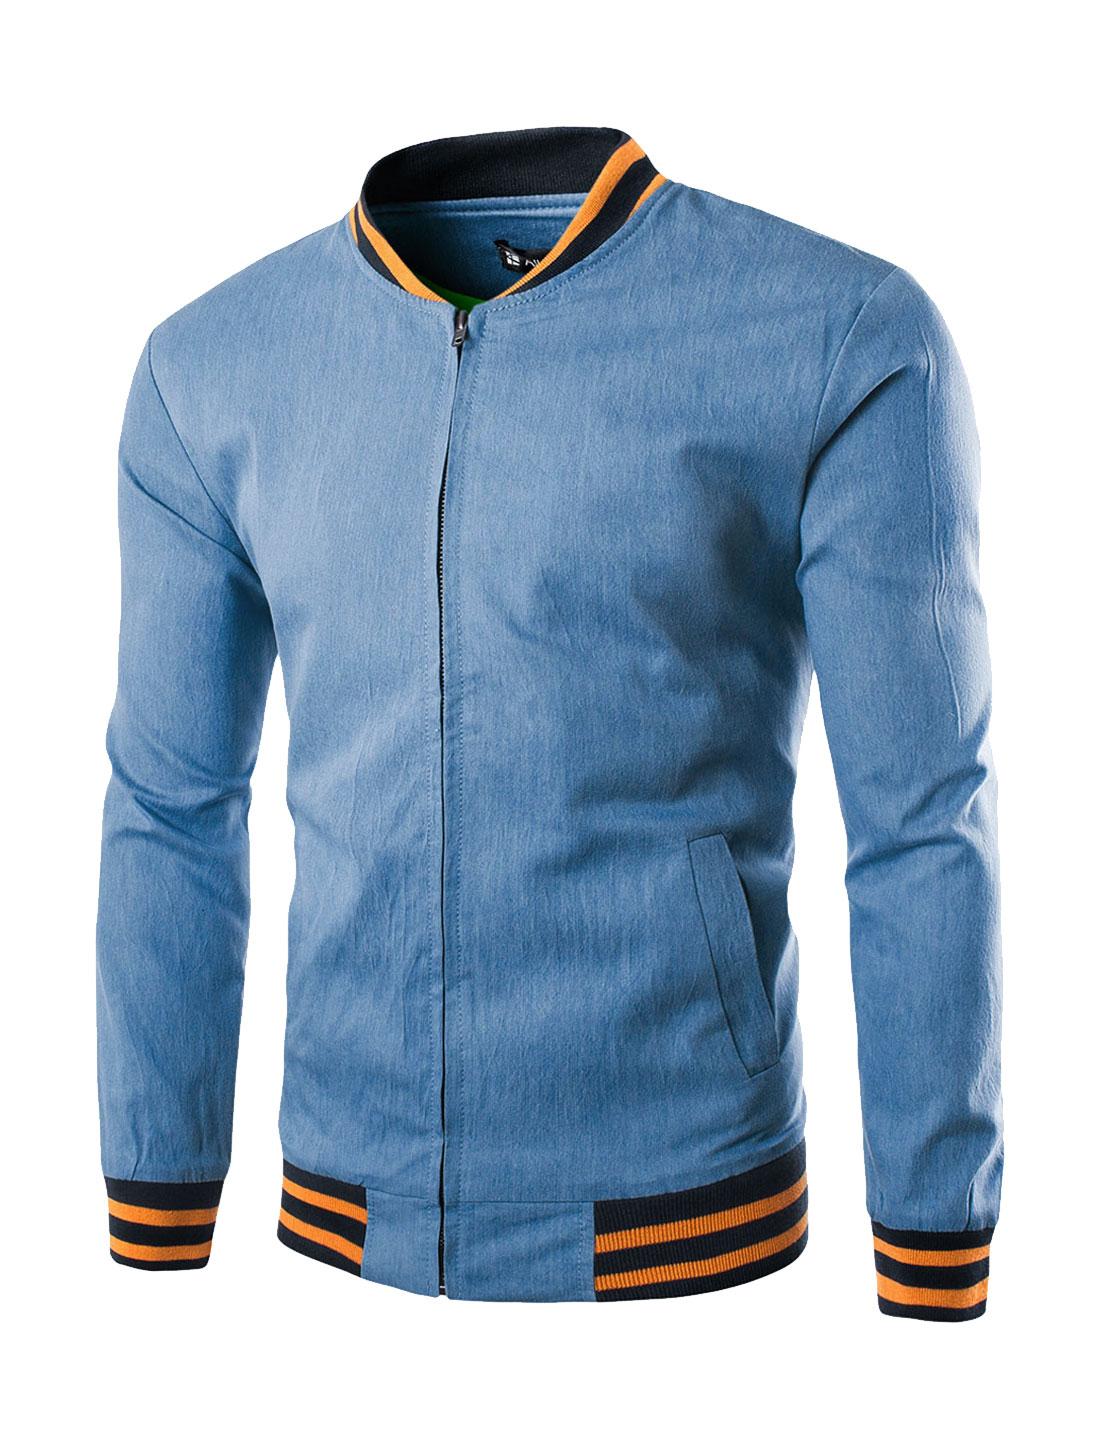 Men Long Sleeve Full Zipper Stand Collar Slim Fit Jacket Blue L